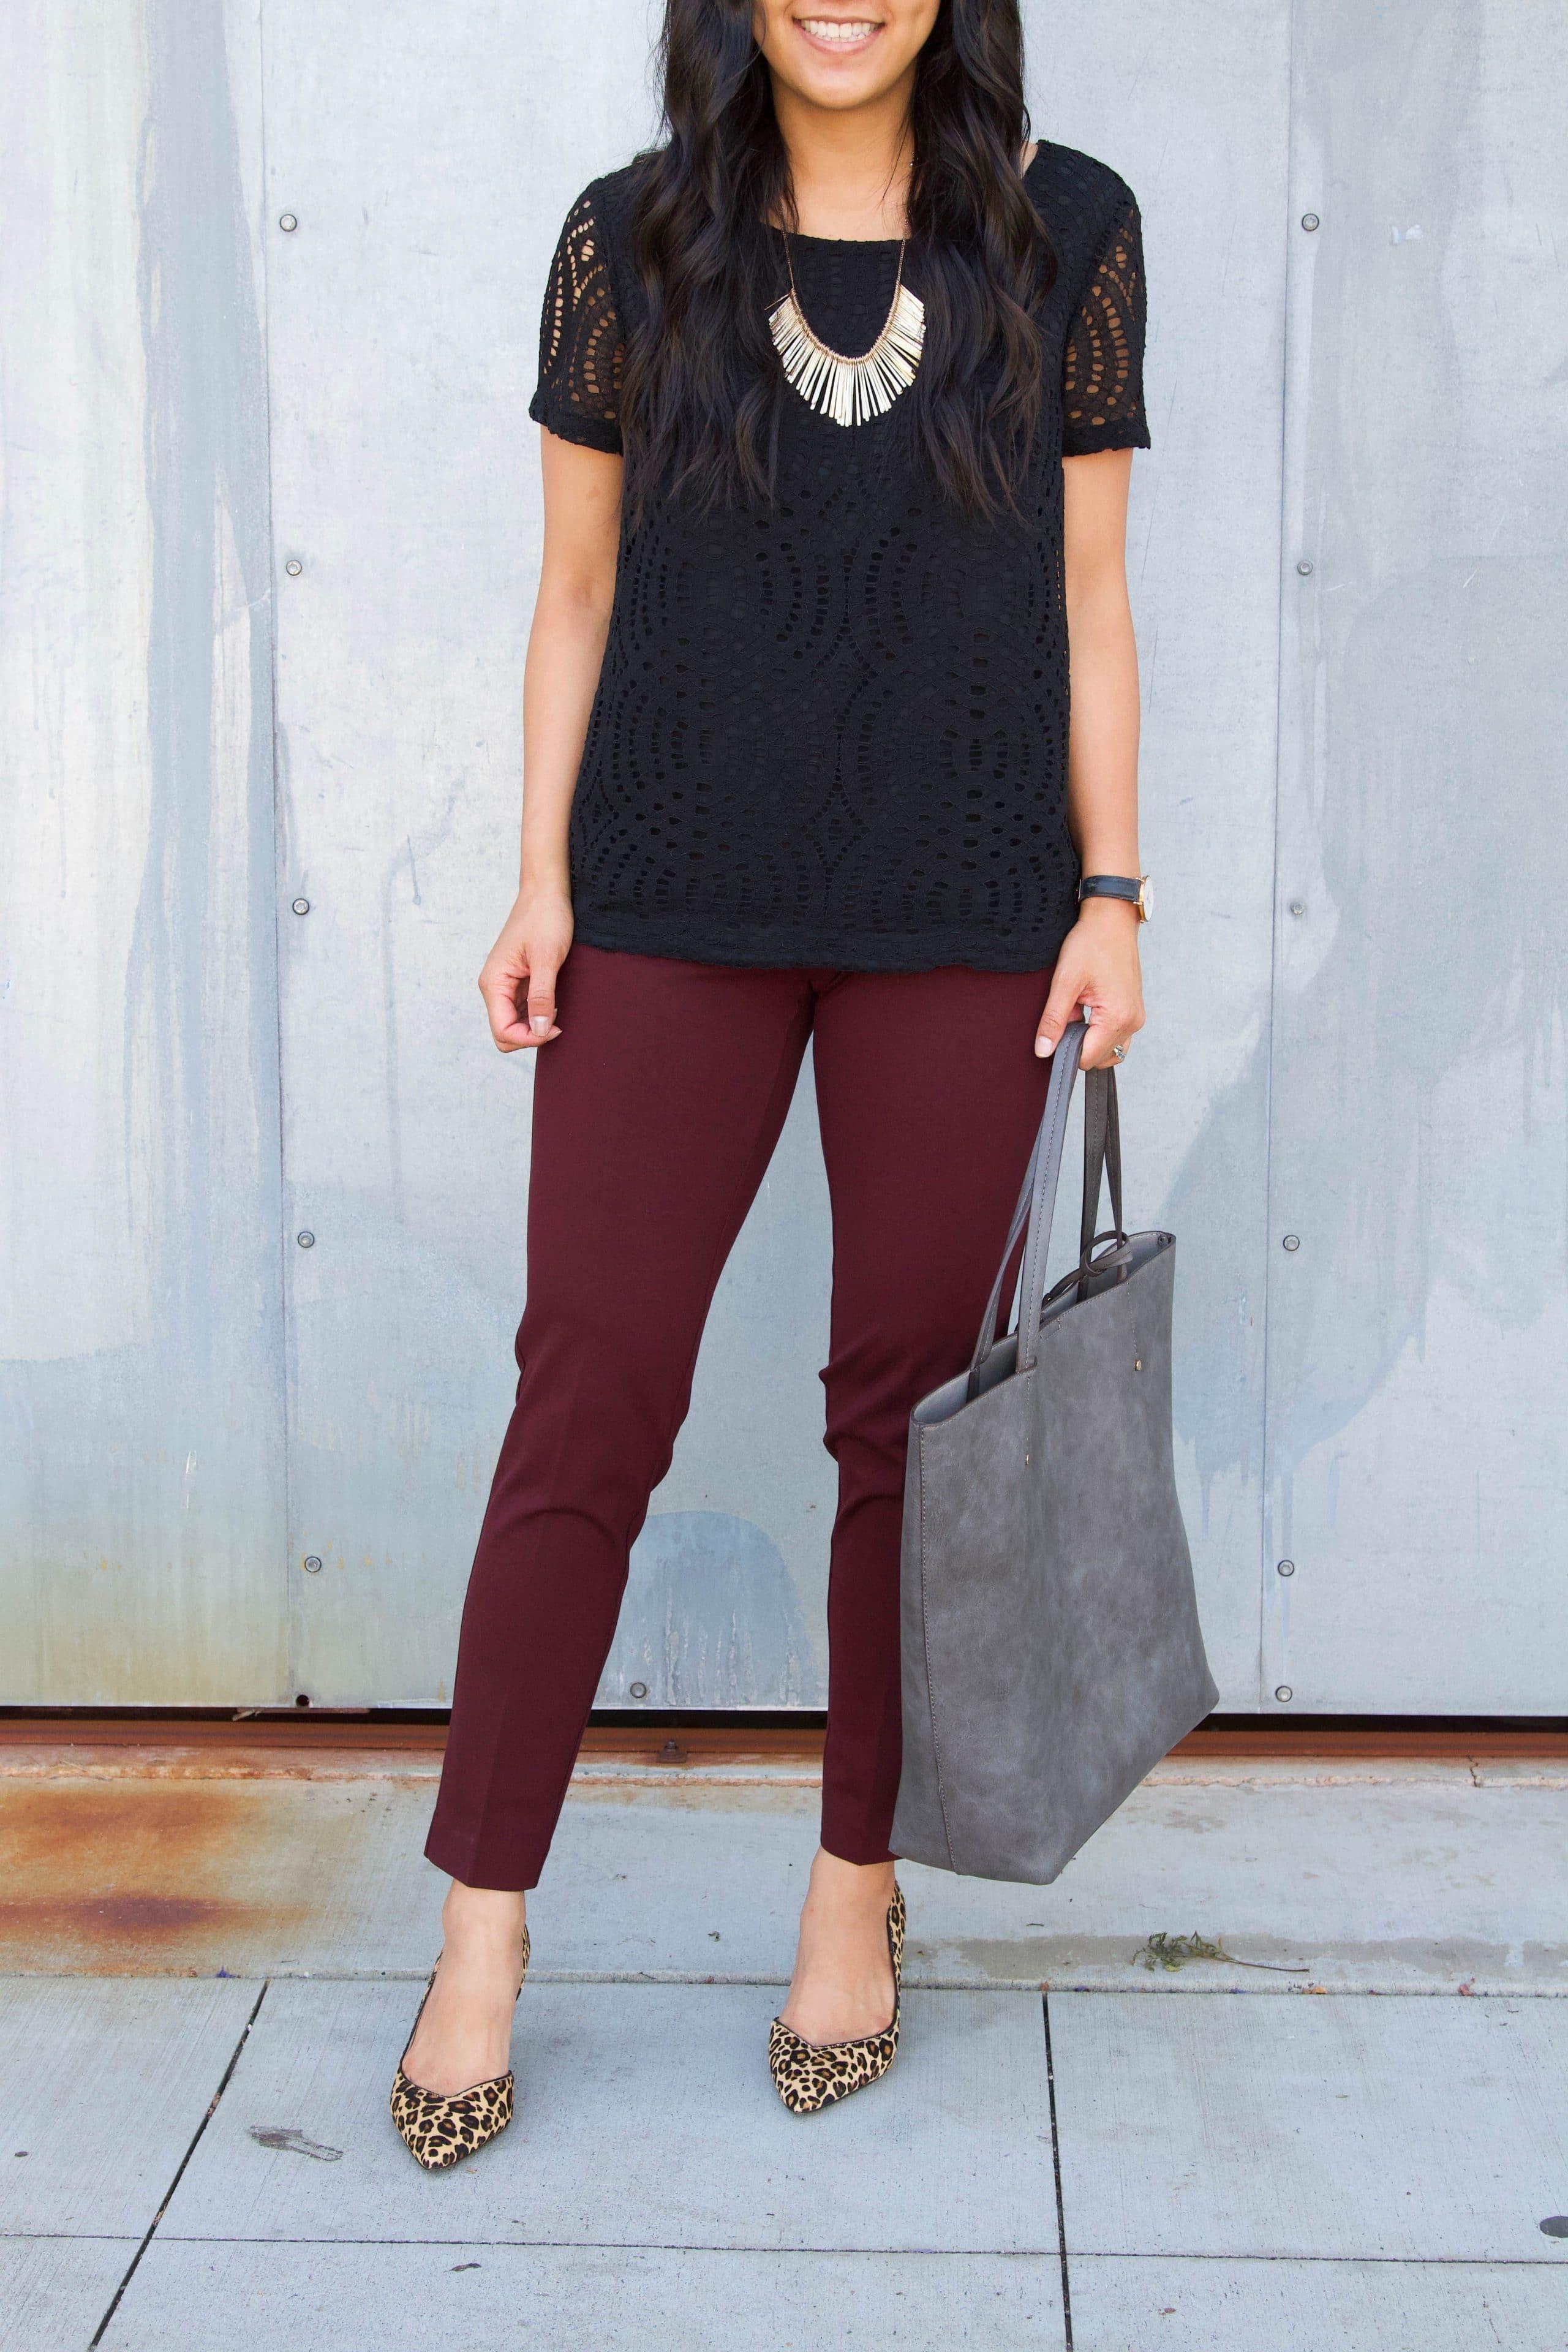 black lace top + leopard print heels + maroon pants + grey tote + statement necklace